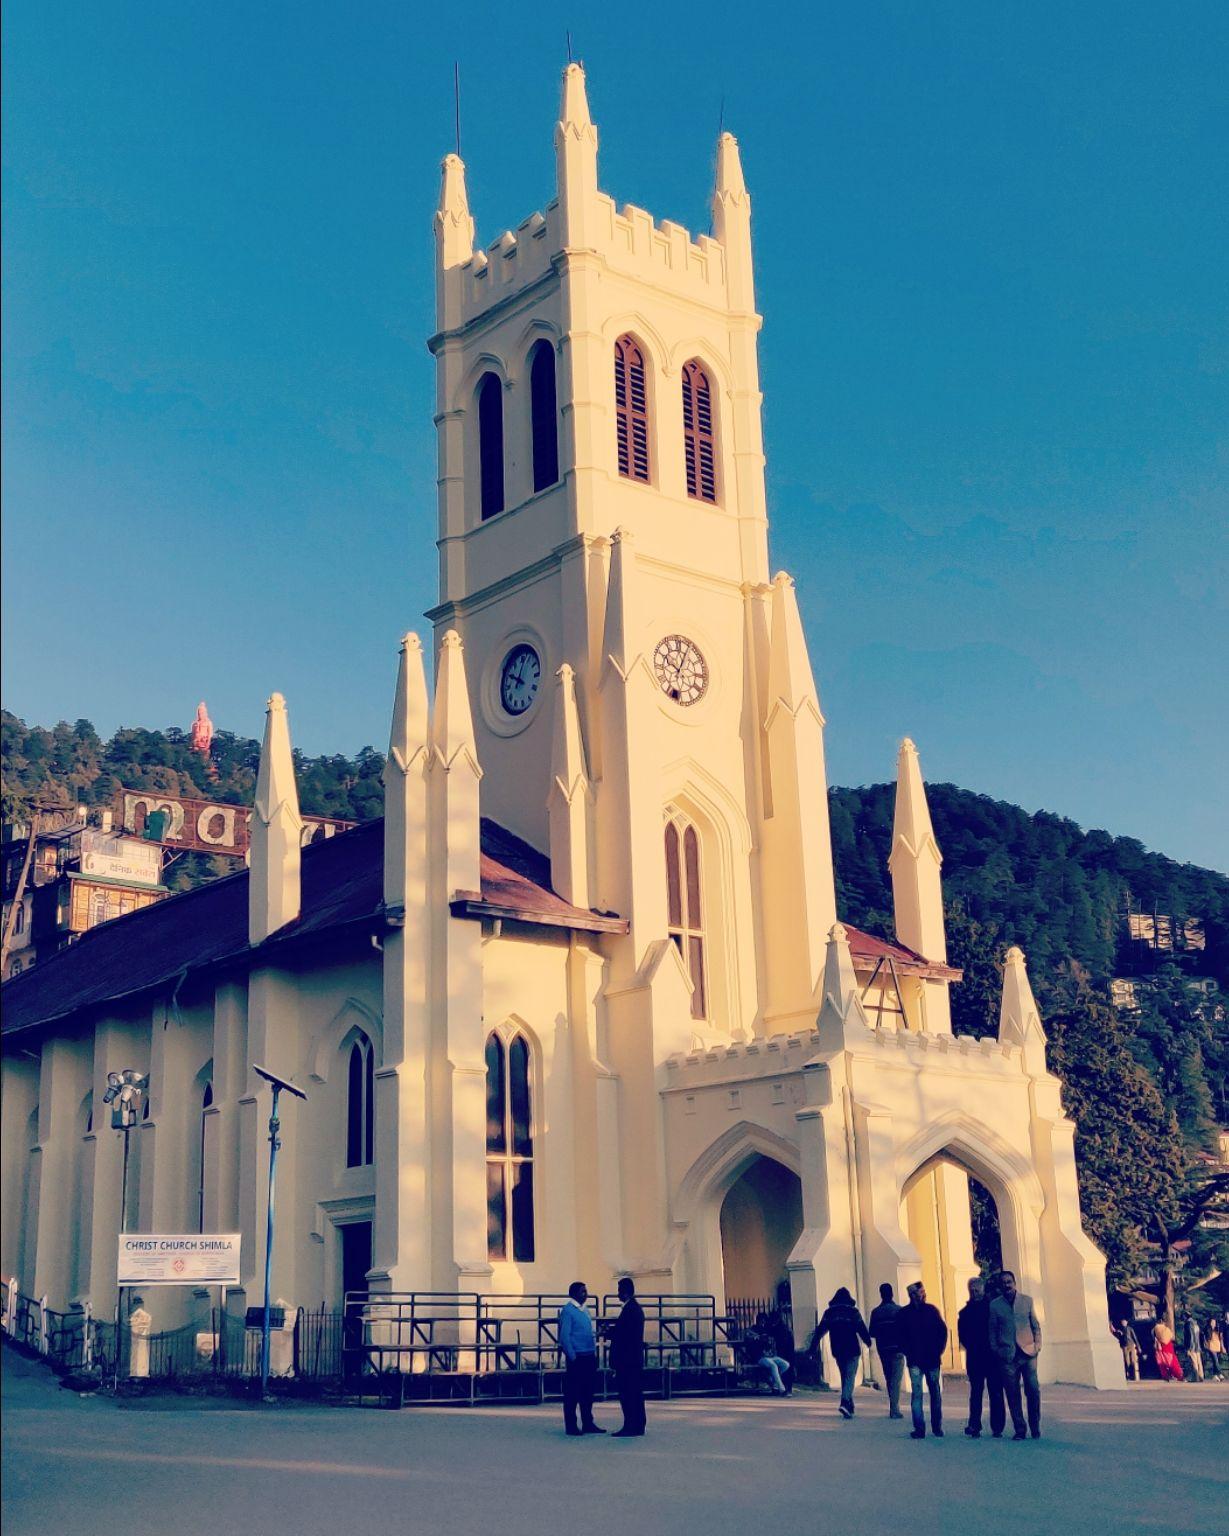 Photo of Christ Church By Aditya Chaphekar